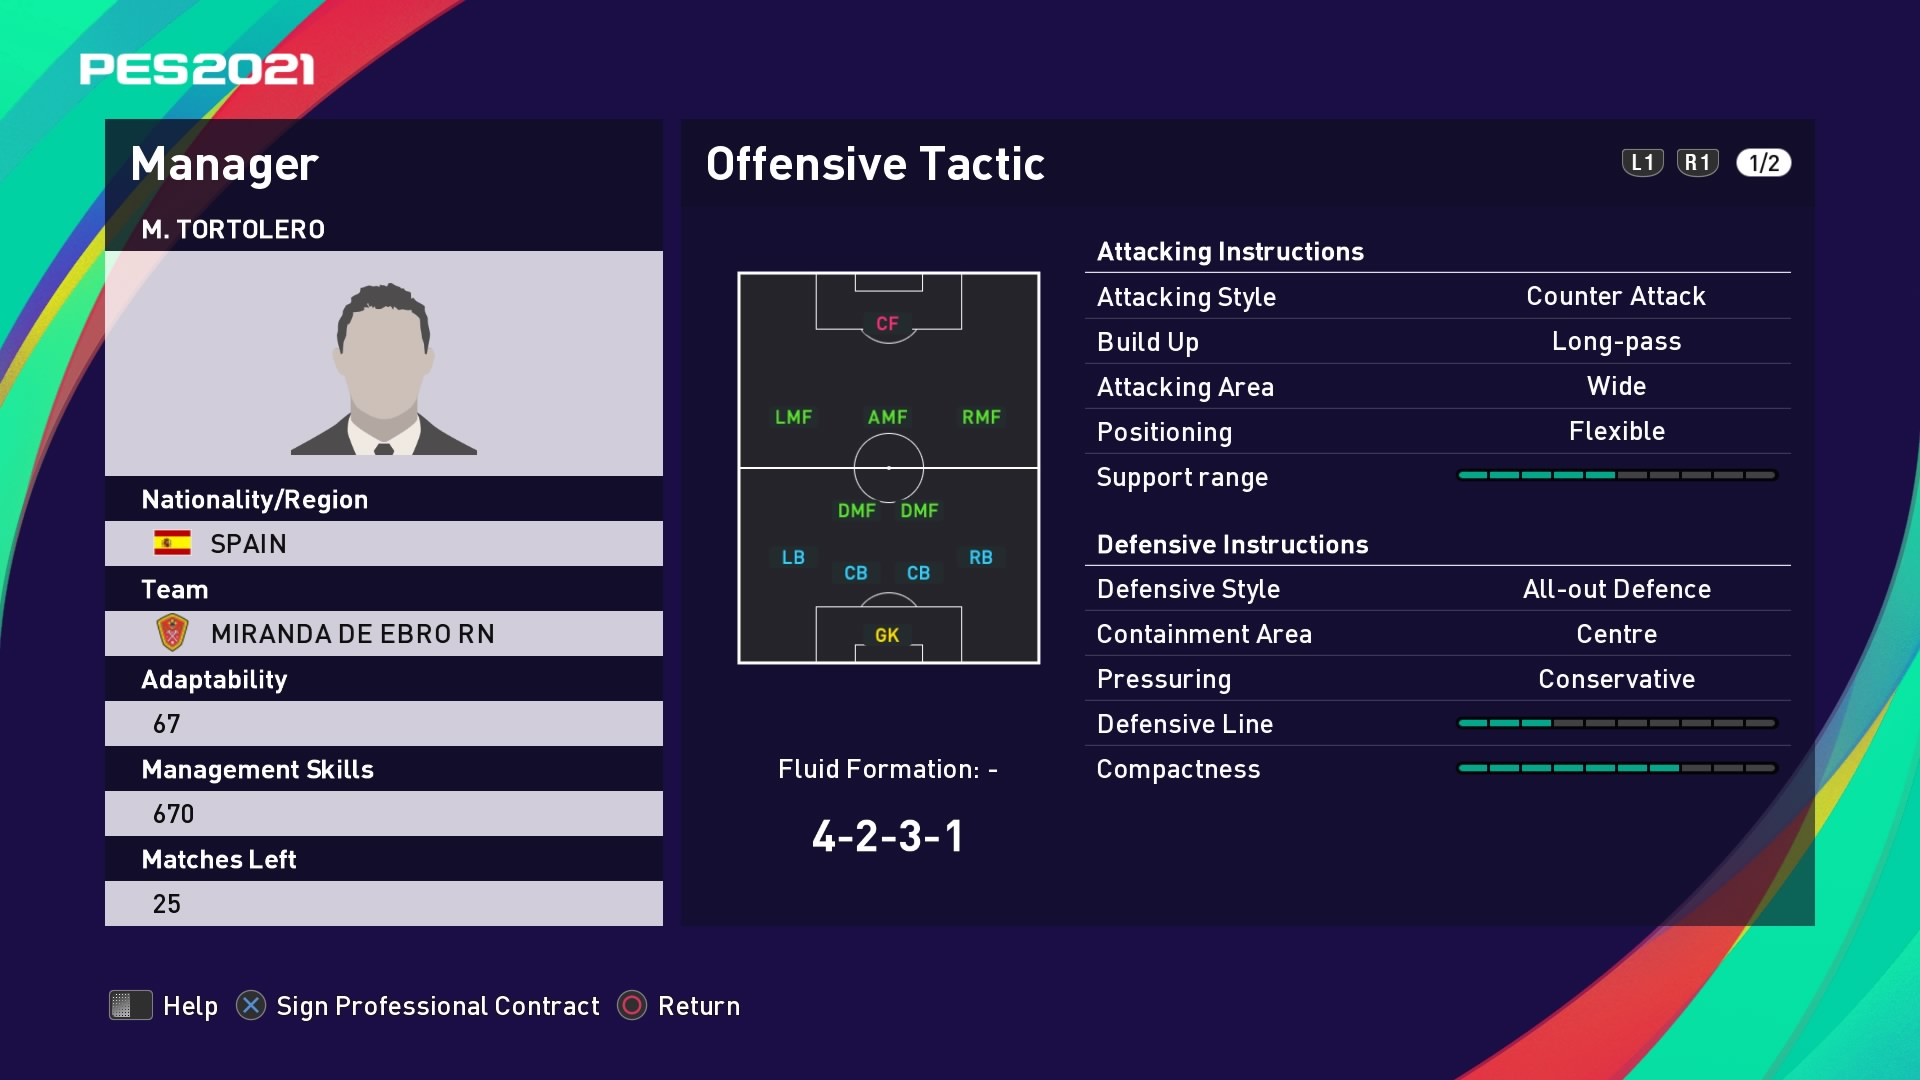 M. Tortolero (José Alberto) Offensive Tactic in PES 2021 myClub